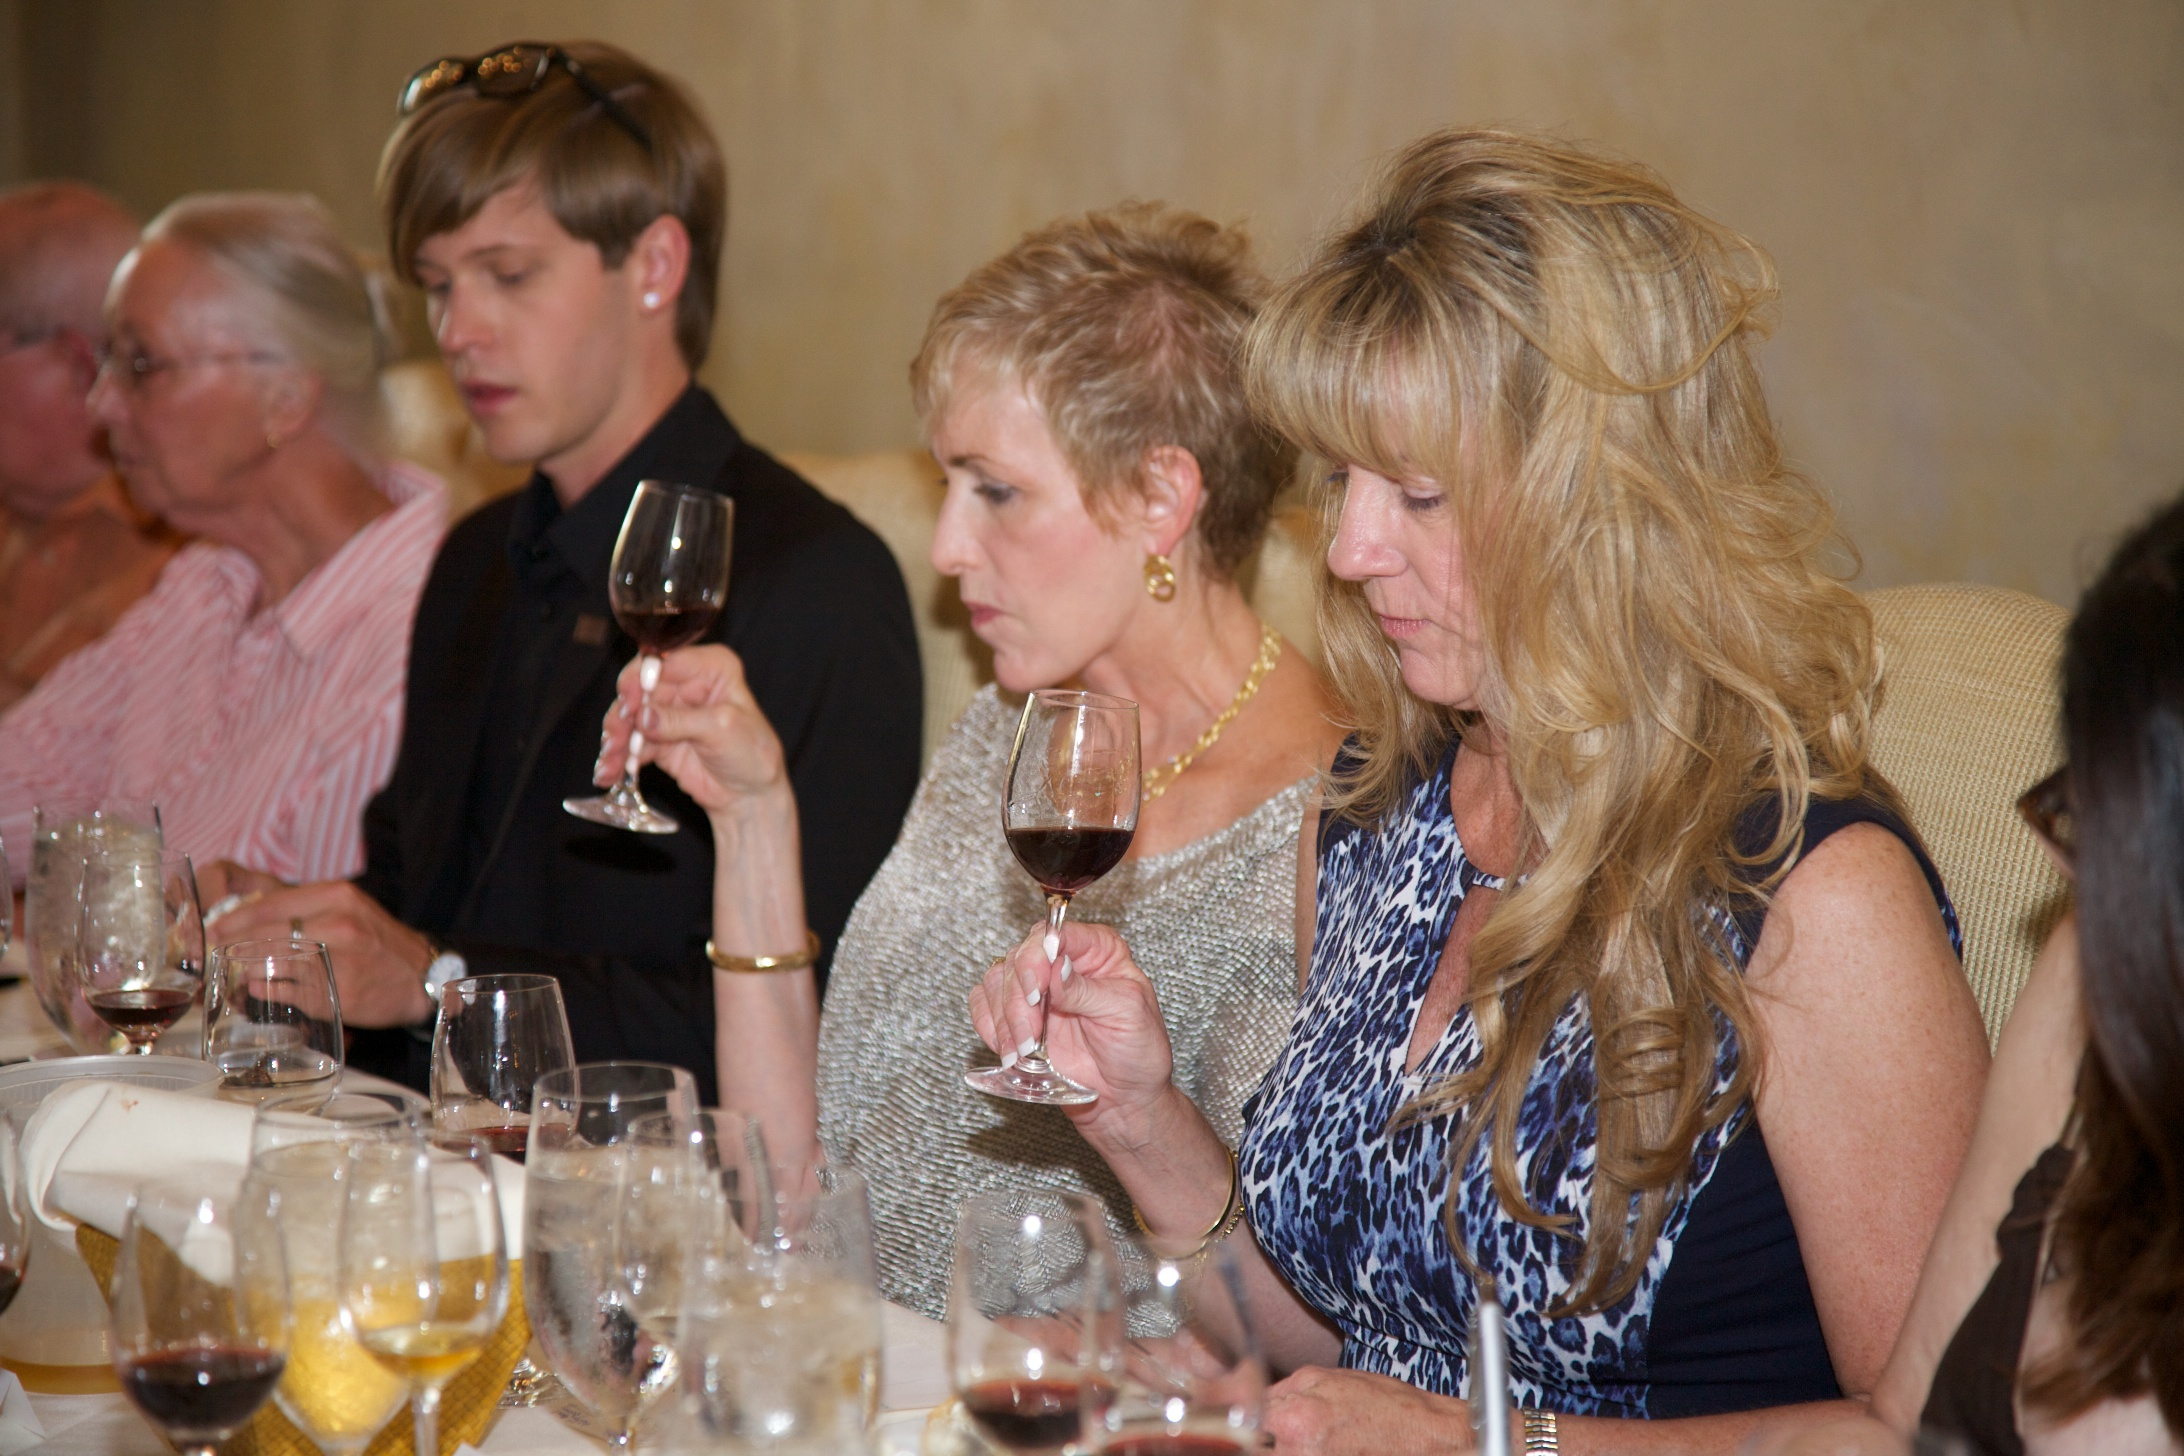 wine tasting seminar irvine orange county